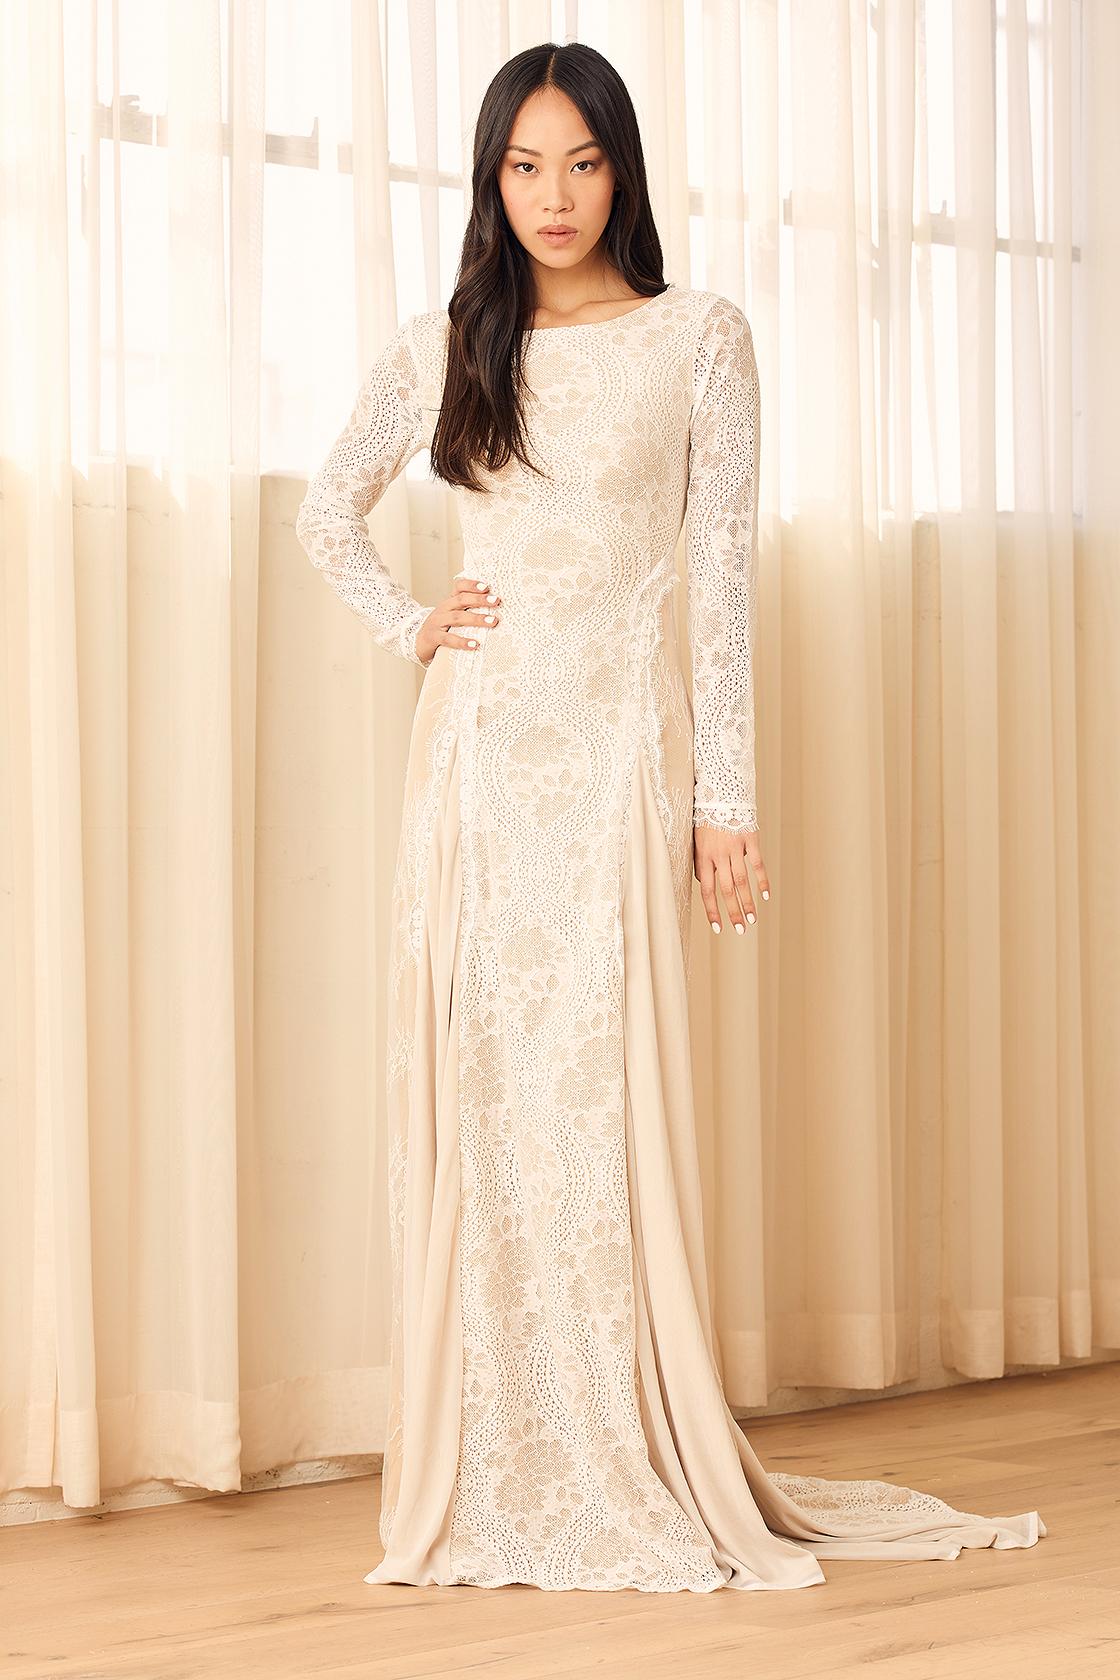 Dreamy Affordable Wedding Dresses For Every Type Of Bride Lulus Com Fashion Blog